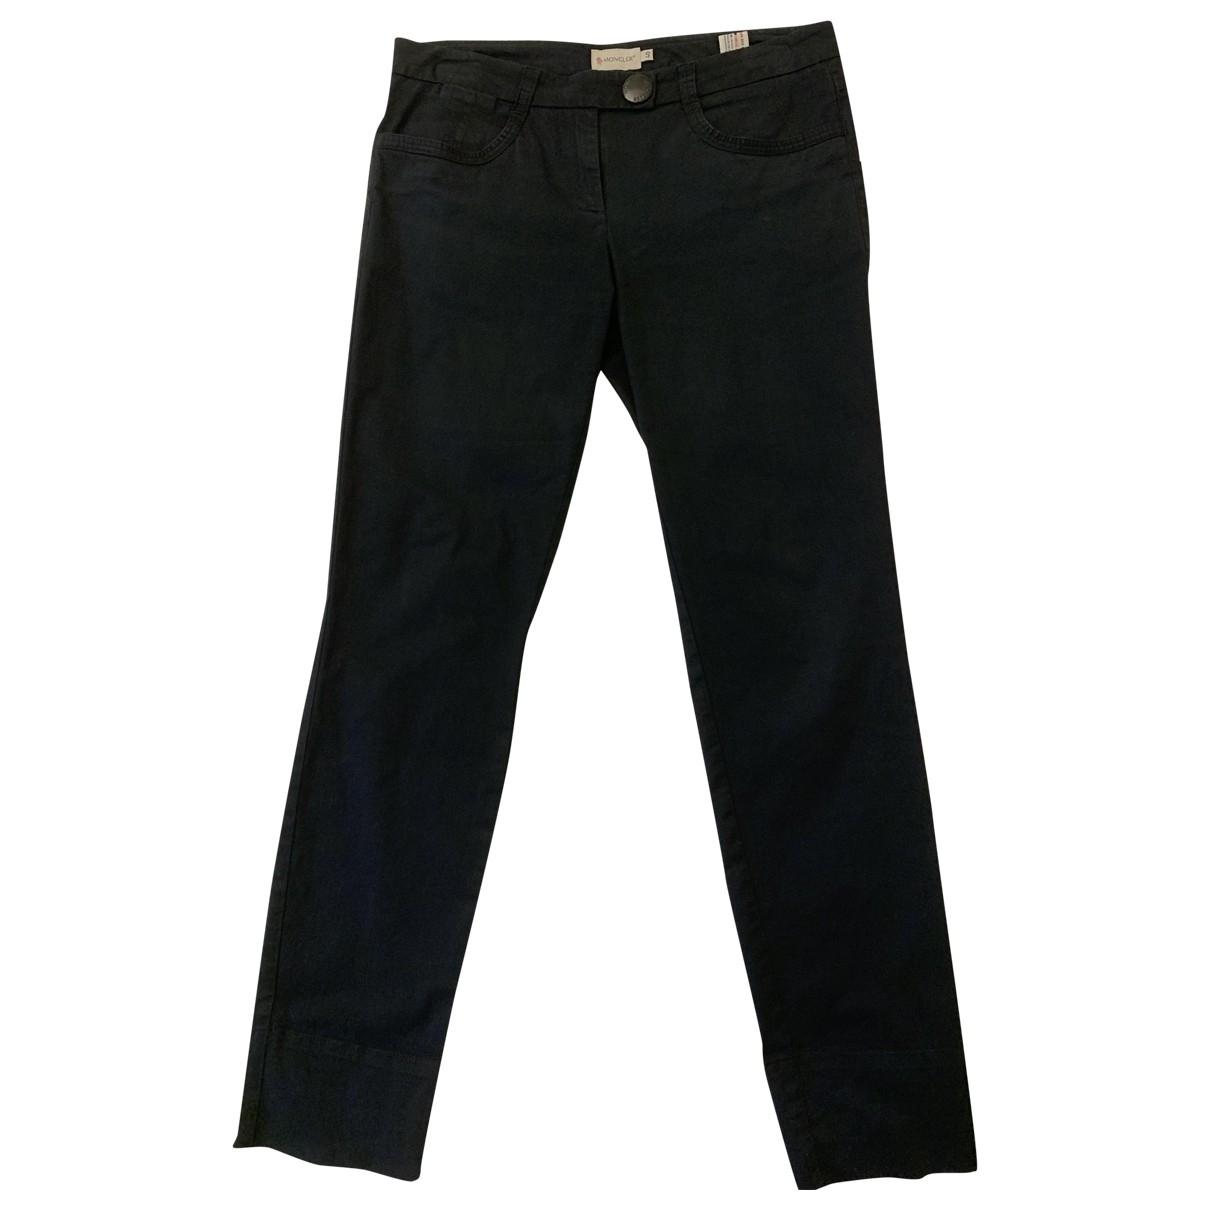 Moncler \N Black Cotton Trousers for Women 40 IT